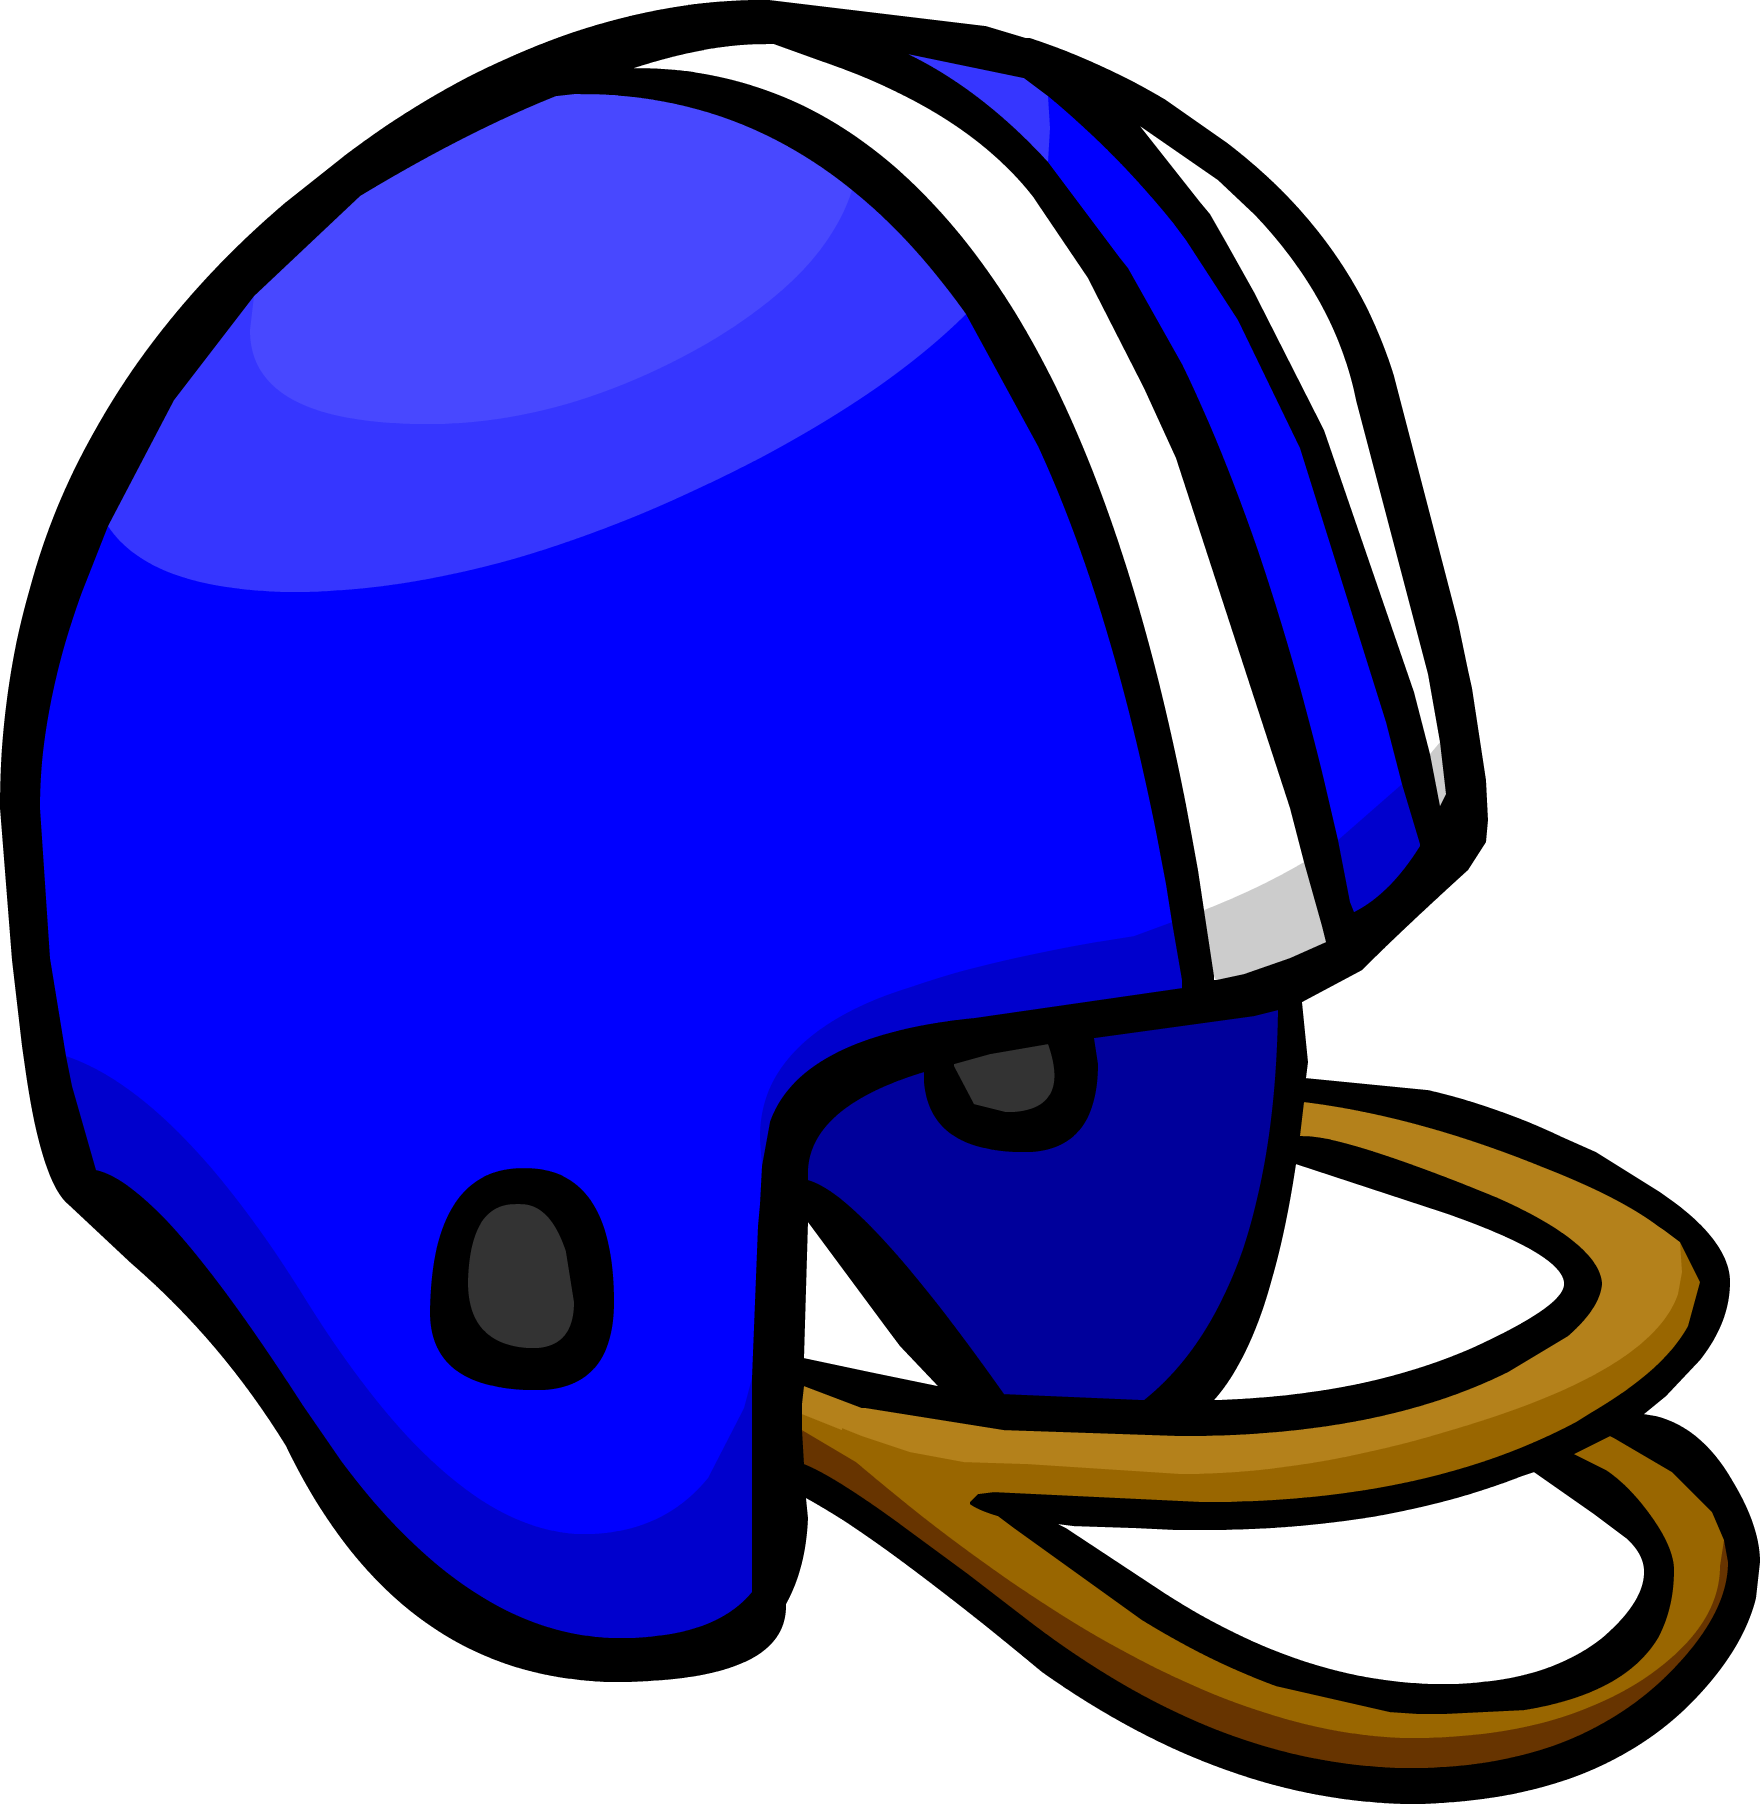 Green football clipart helmet against helmet picture transparent library Blue Football Helmet | Club Penguin Wiki | FANDOM powered by Wikia picture transparent library